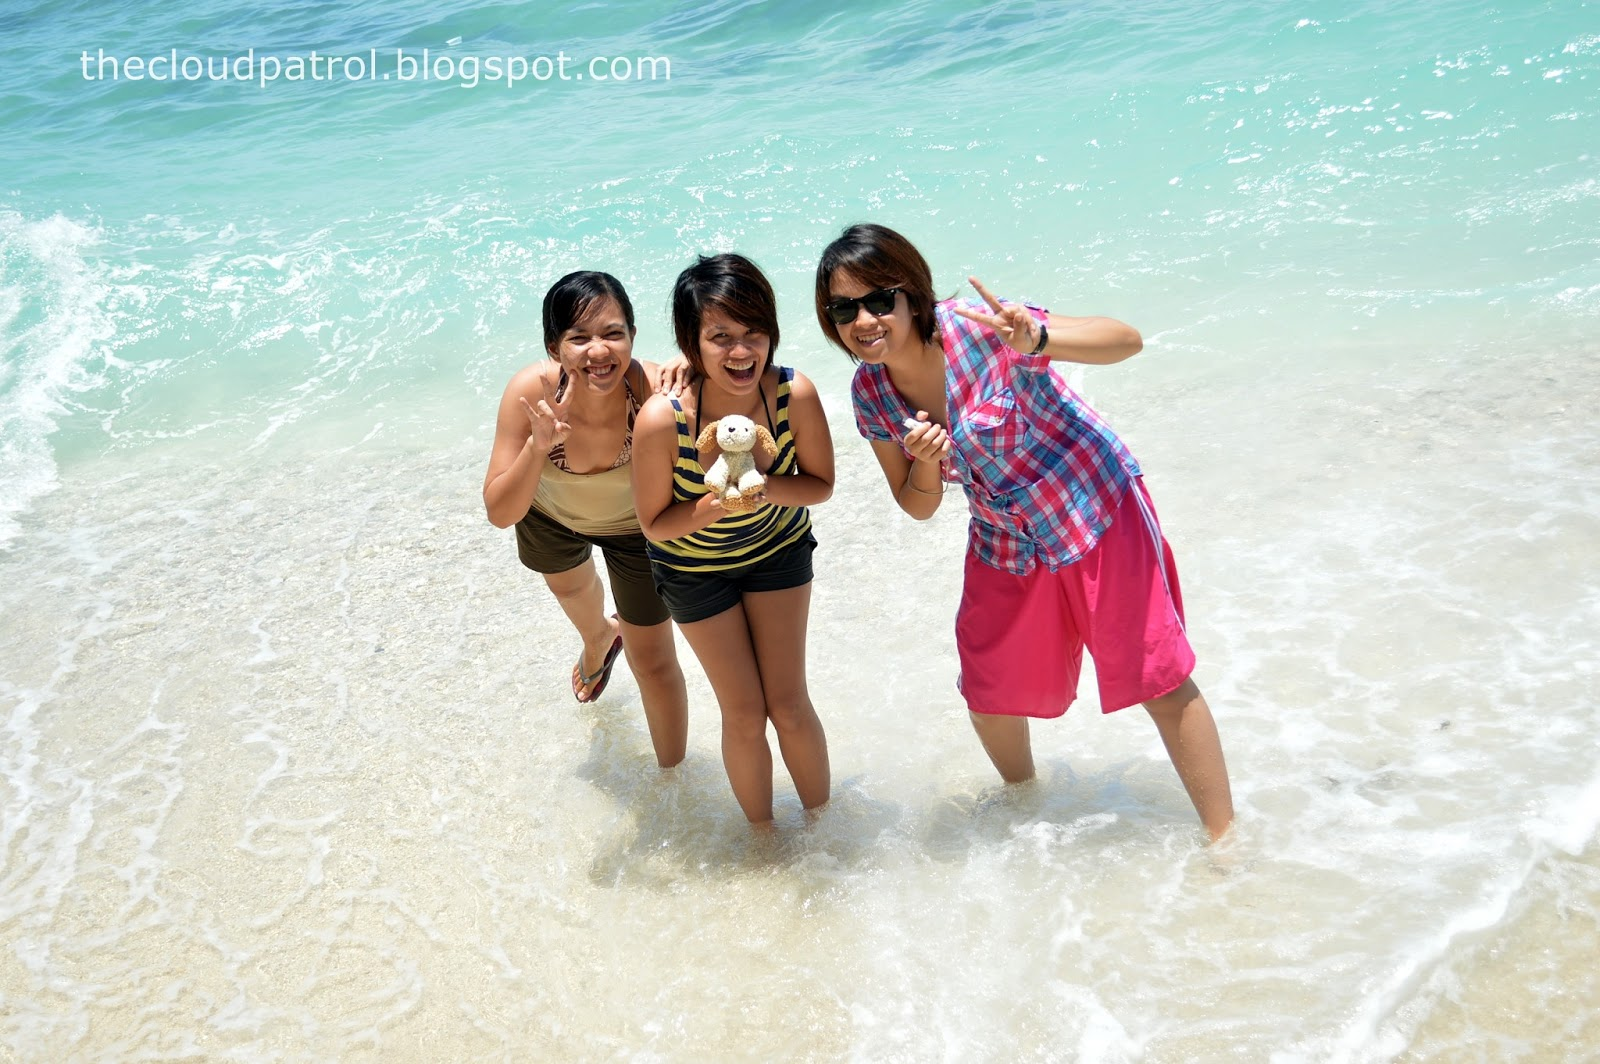 Butanding, whale shark, cebu, oslob, philippines, white sand, beach